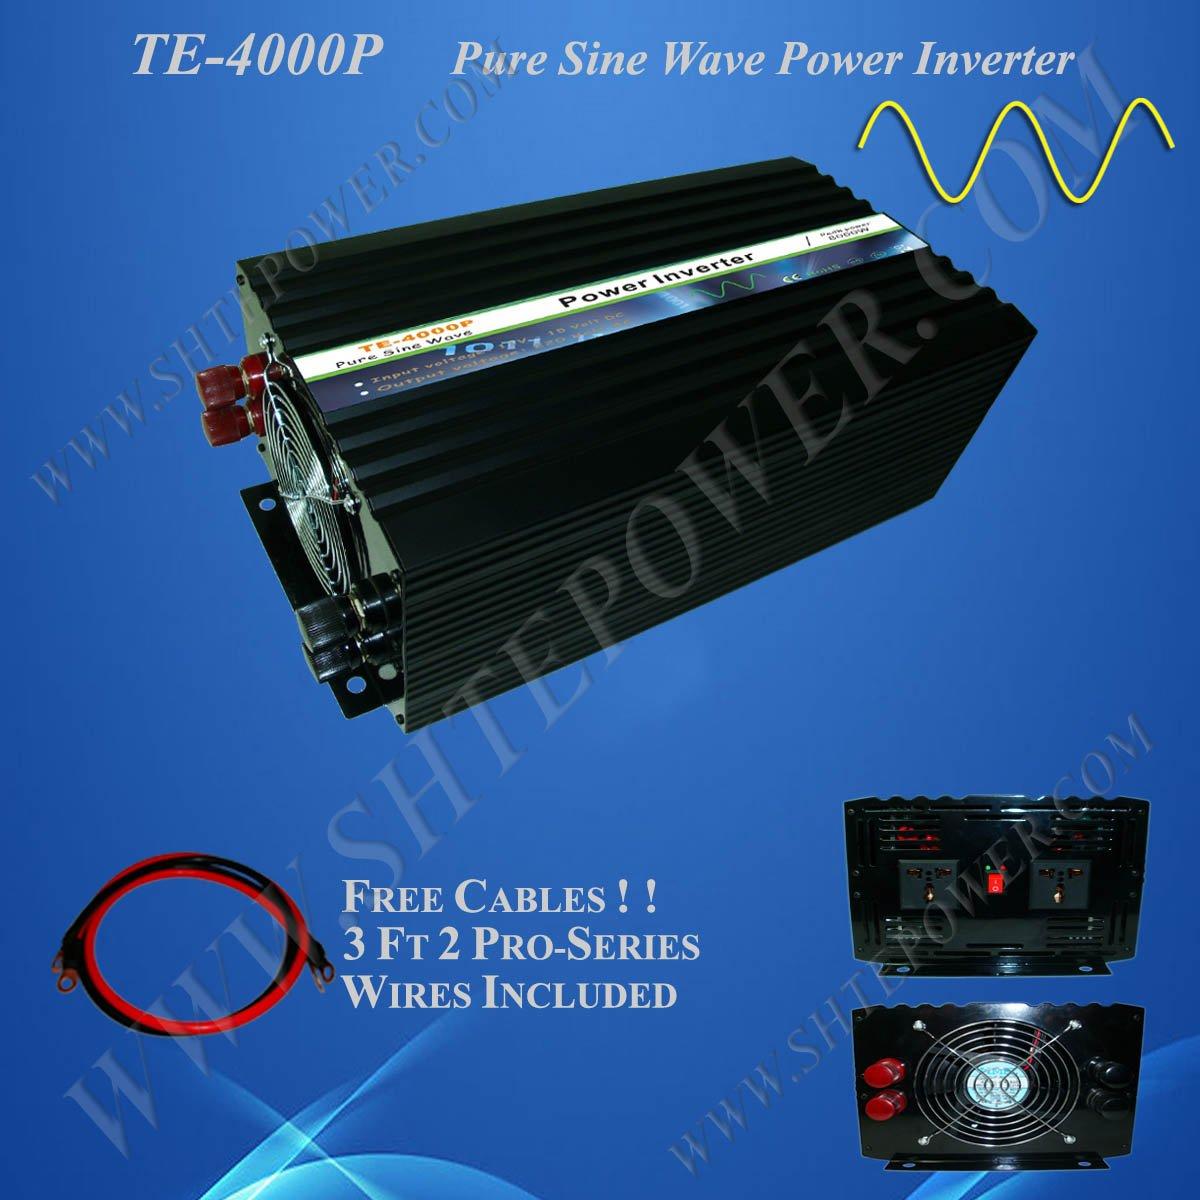 24v dc to 120v ac pure sine wave 4000w inverter 110v power inverter мультиметр uyigao ac dc ua18